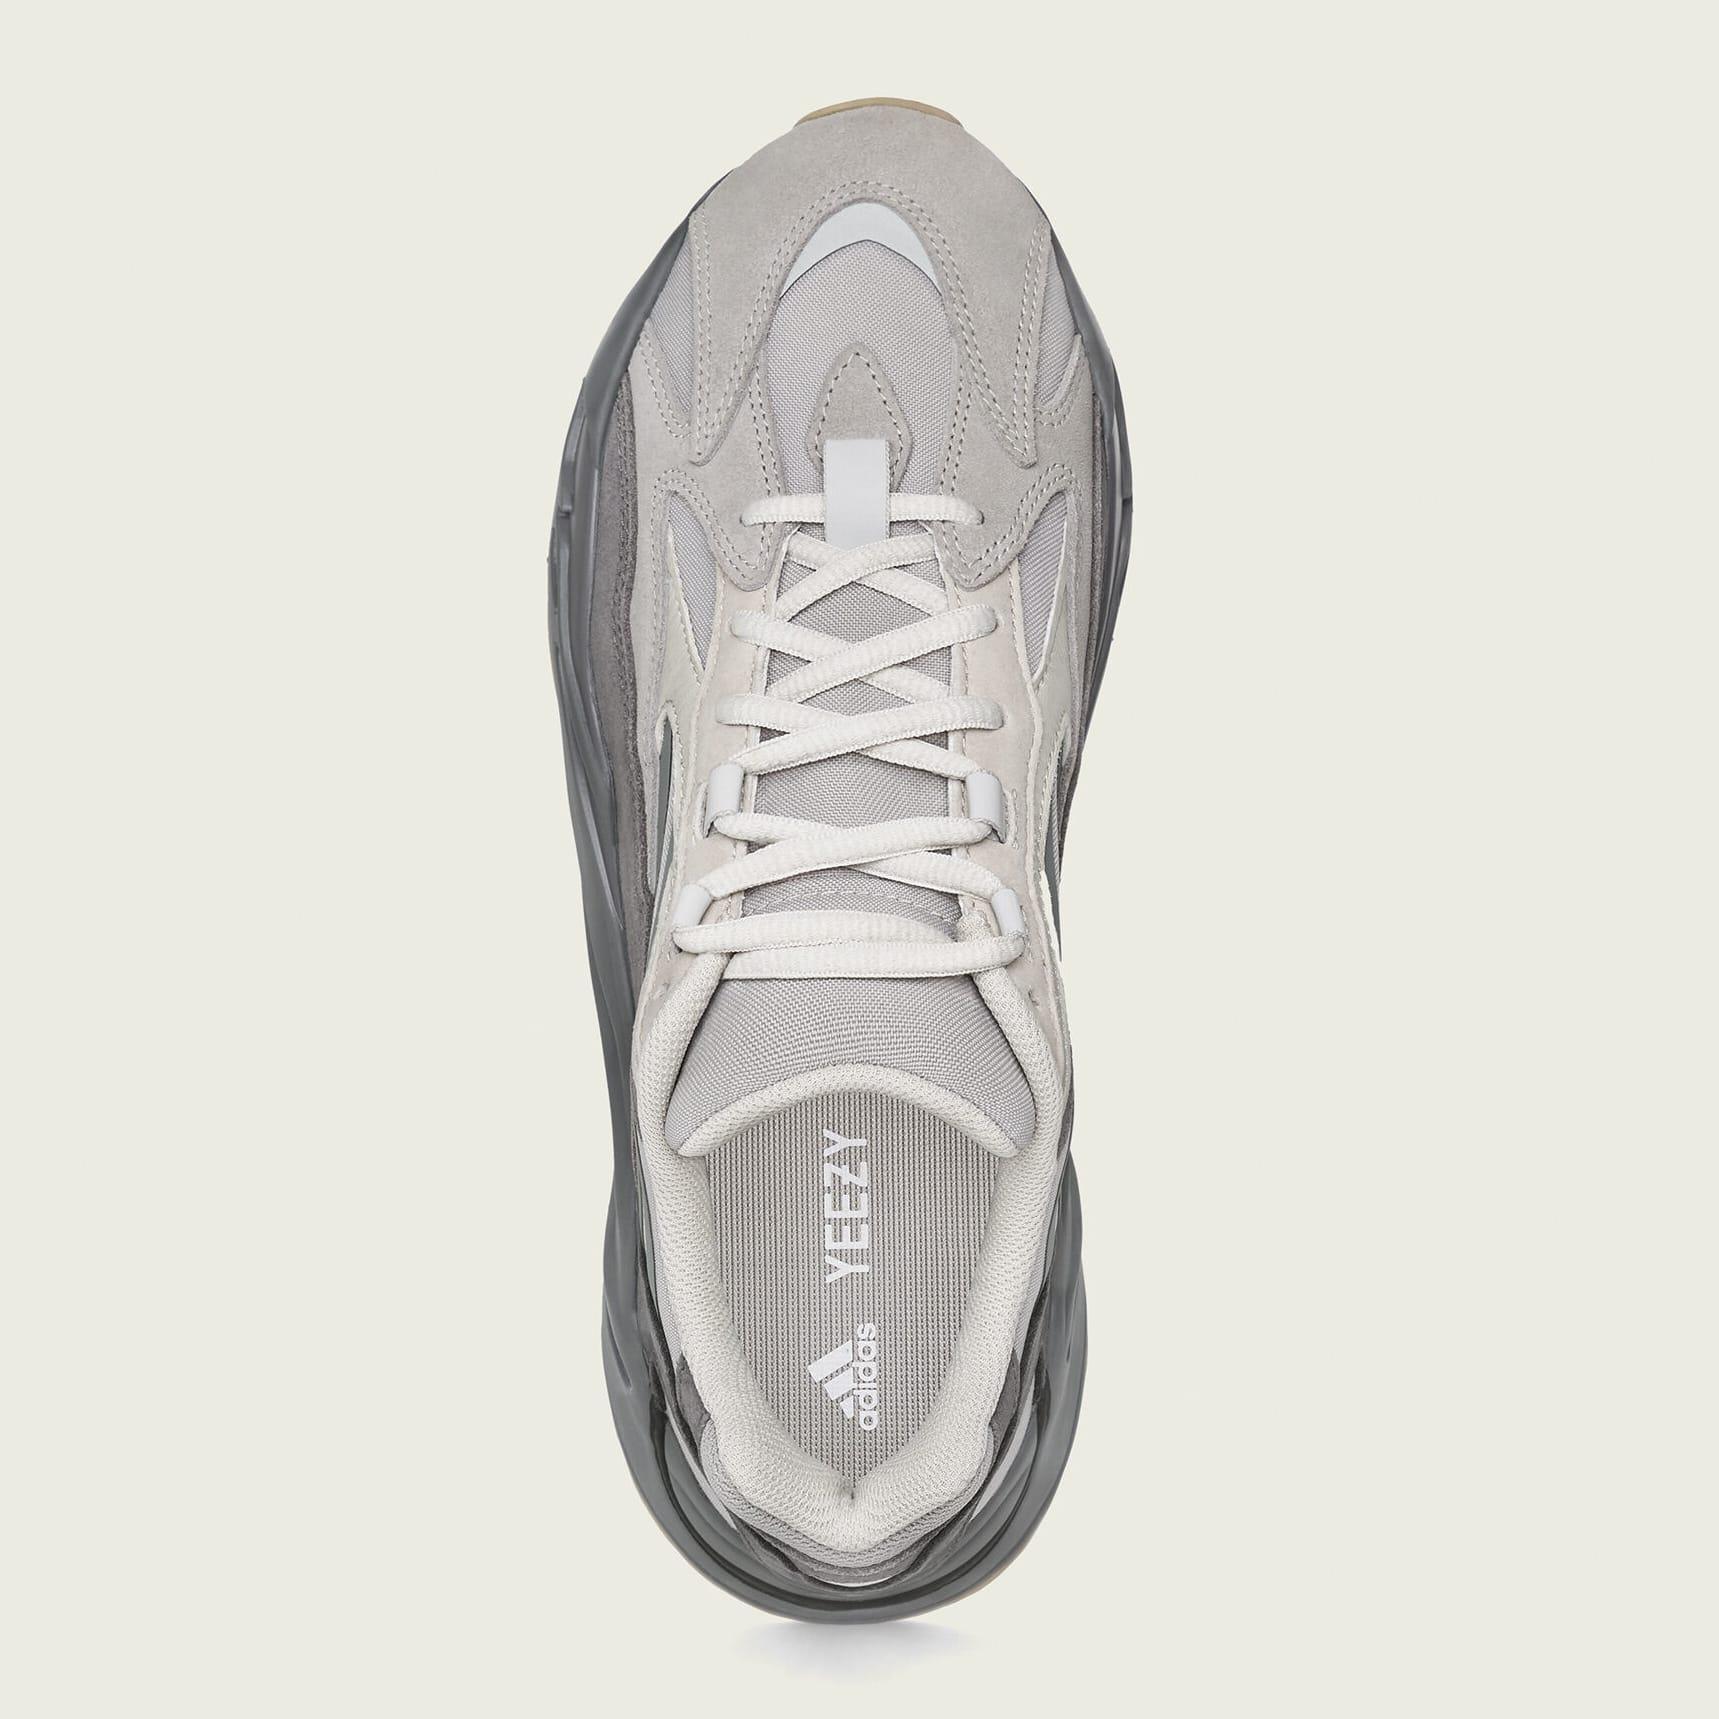 Adidas Yeezy Boost 700 V2 'Tephra' FU7914 Top